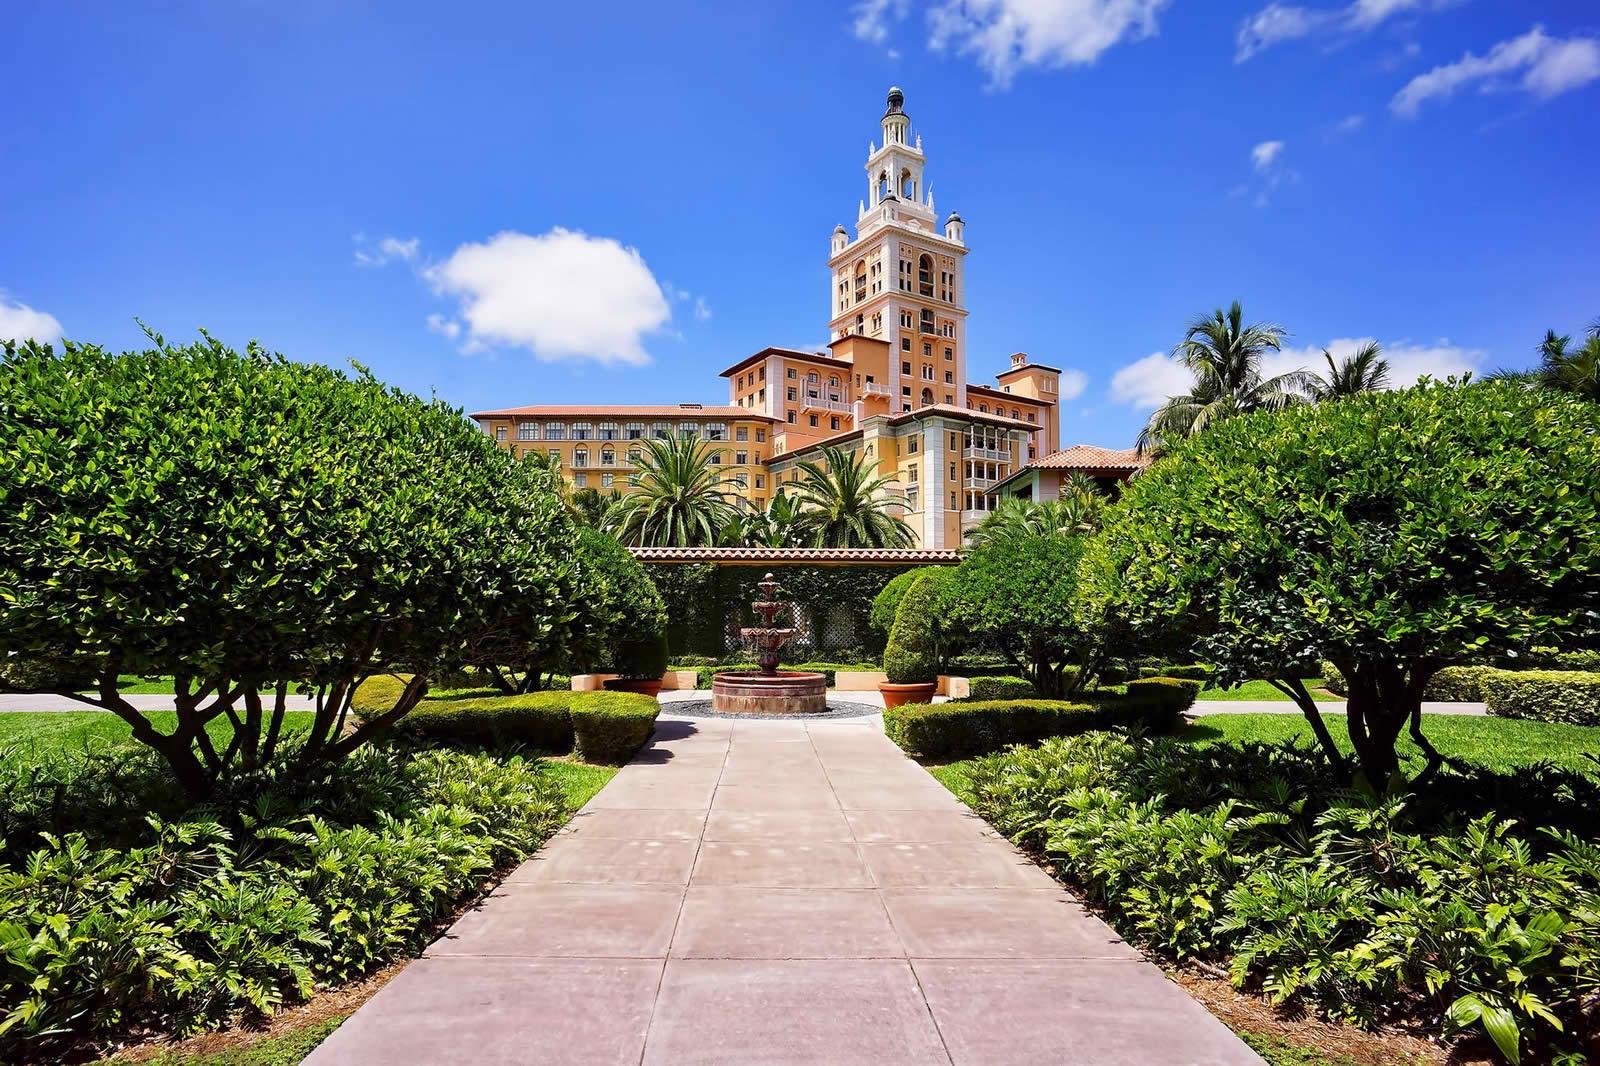 Biltmore Hotel in Miami : Experience the Most Majestic ...